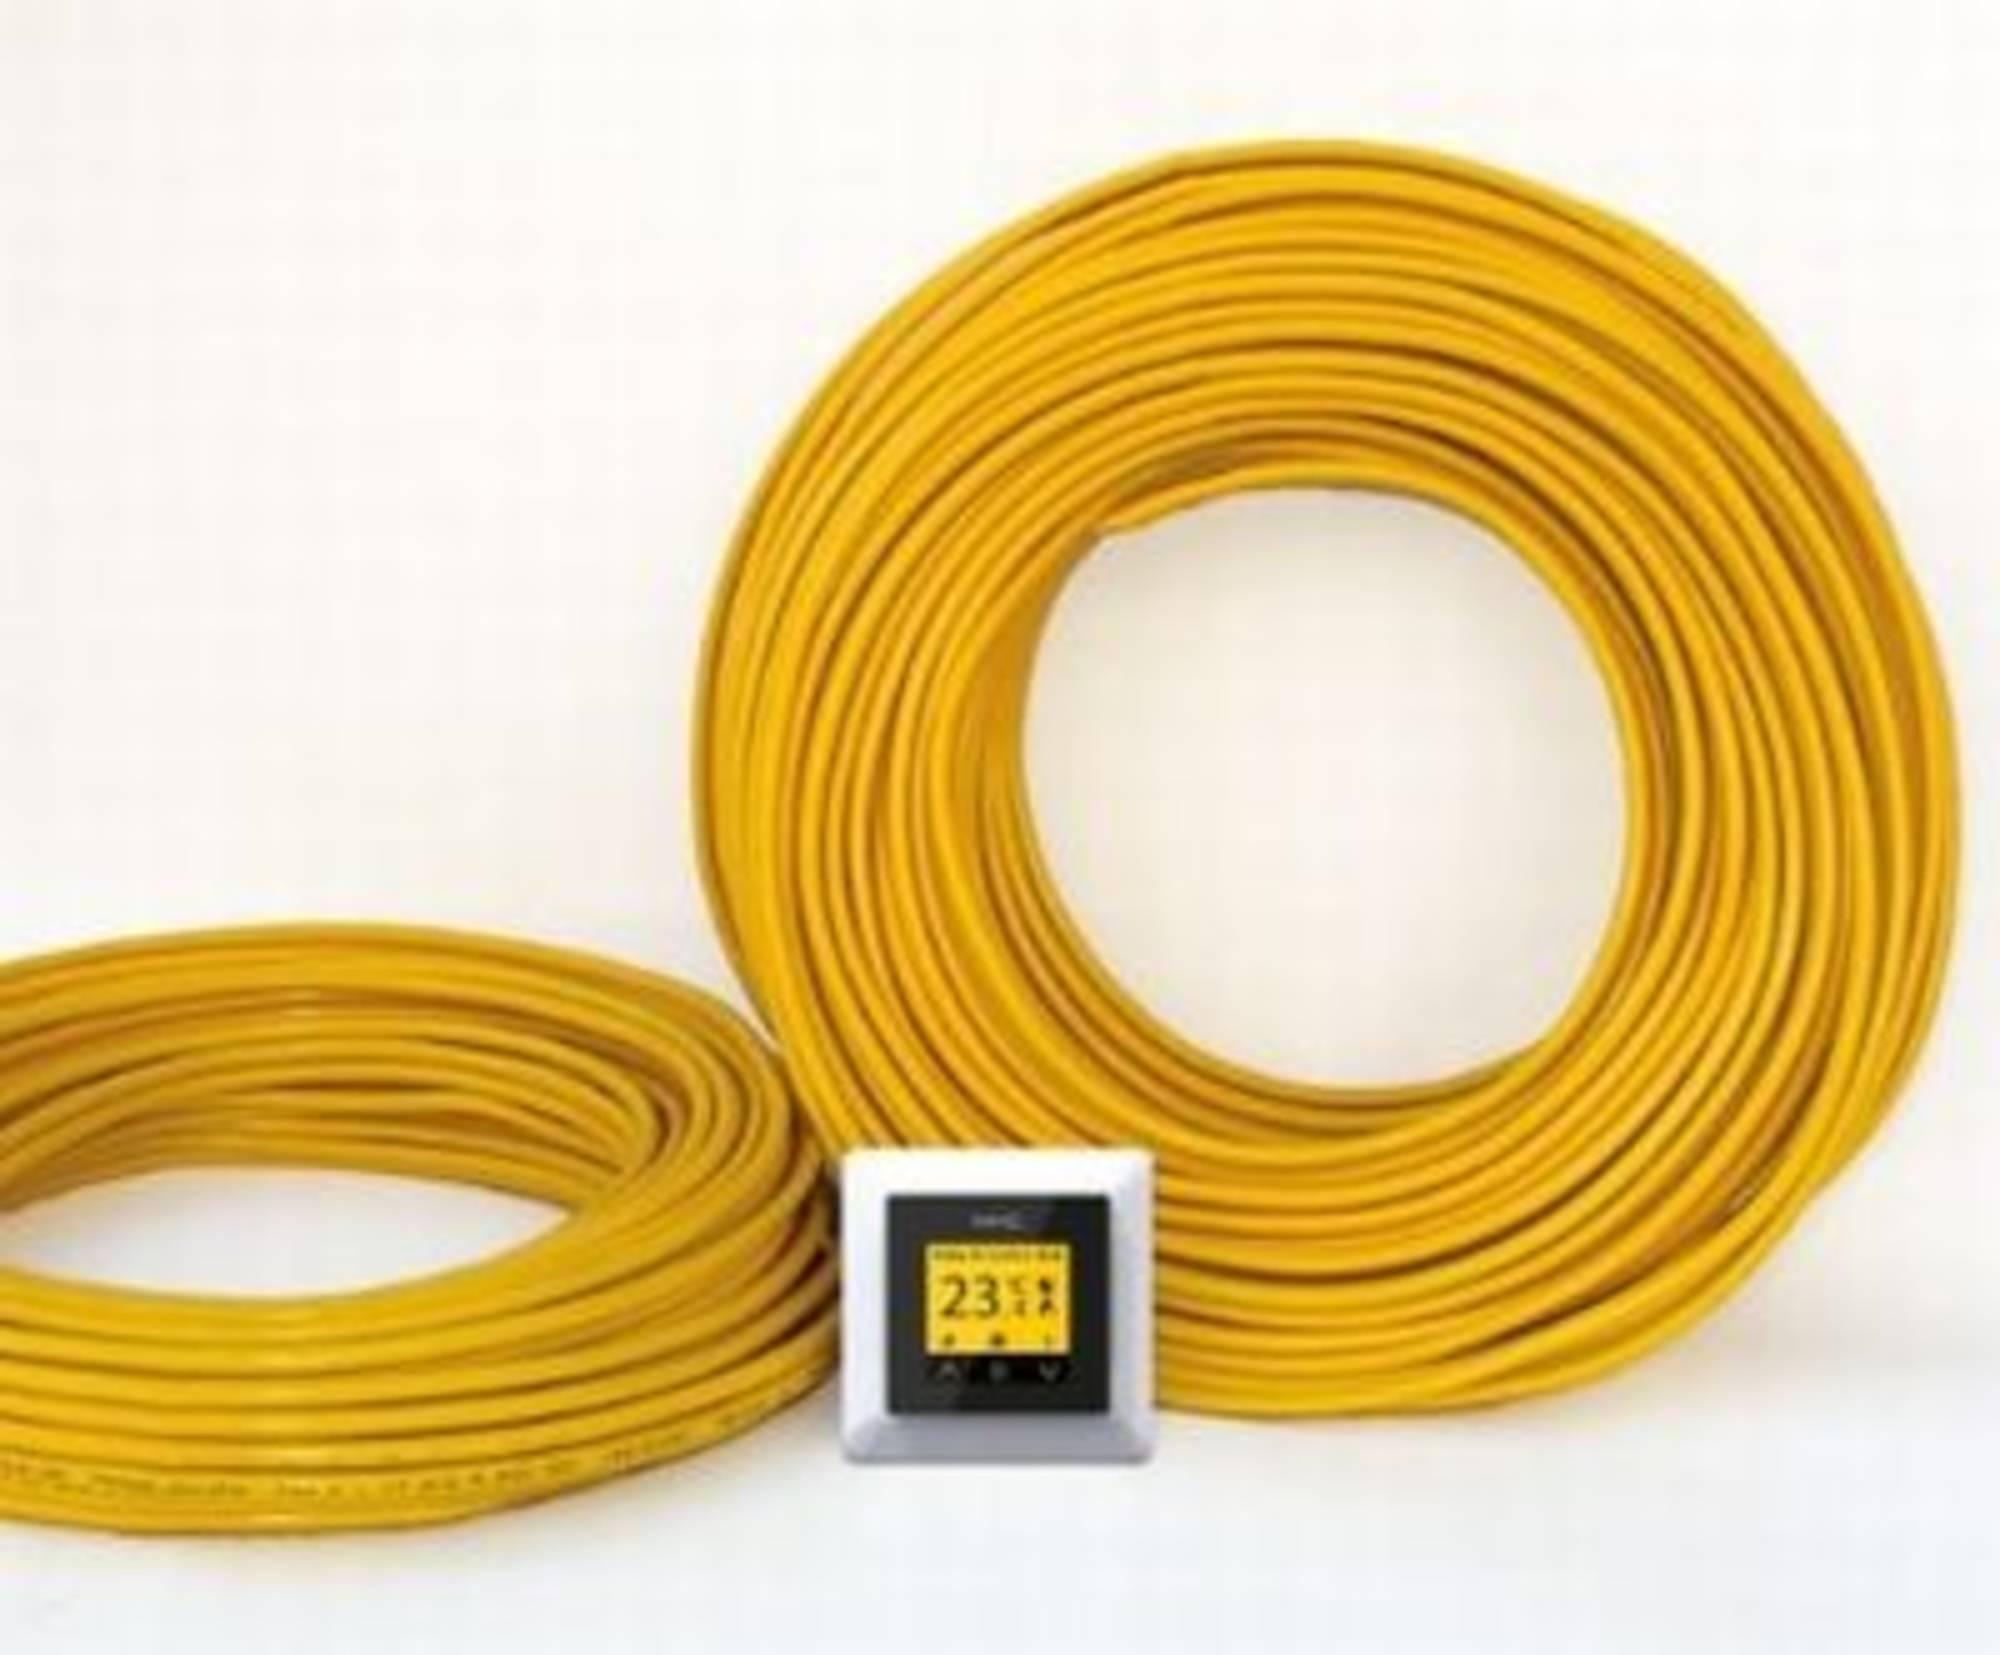 Magnum X-treme control cable verwarmingsset 2100w 123,5 m.